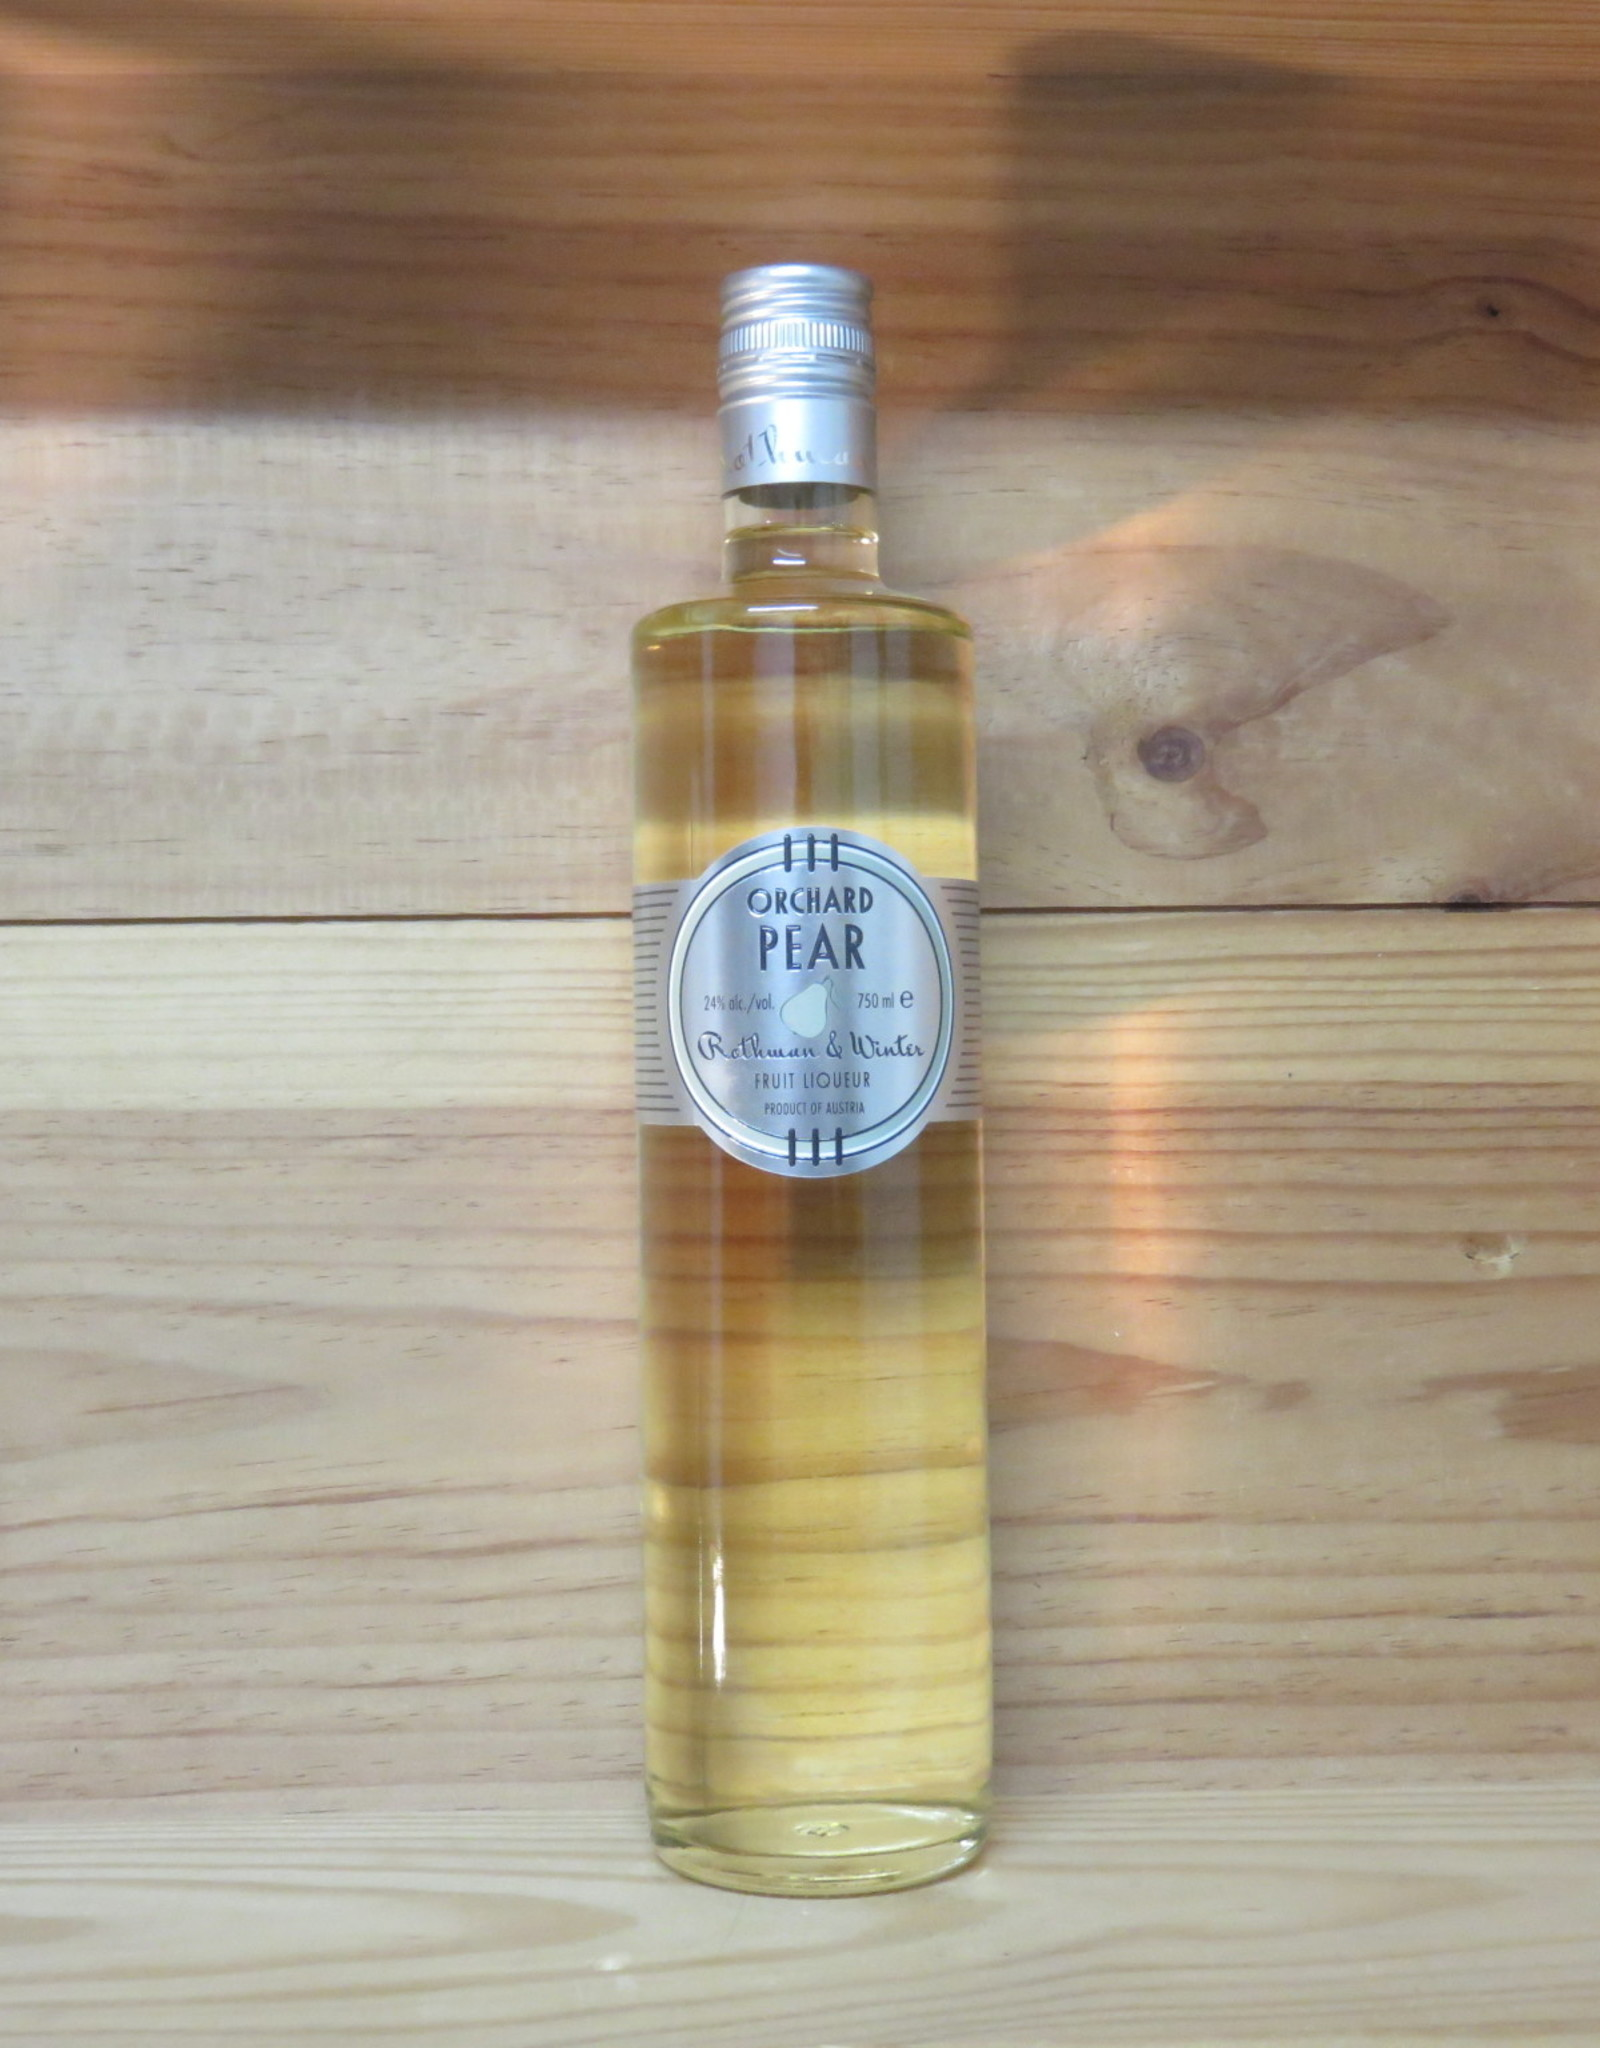 Rothman & Winter - Orchard Pear Liqueur